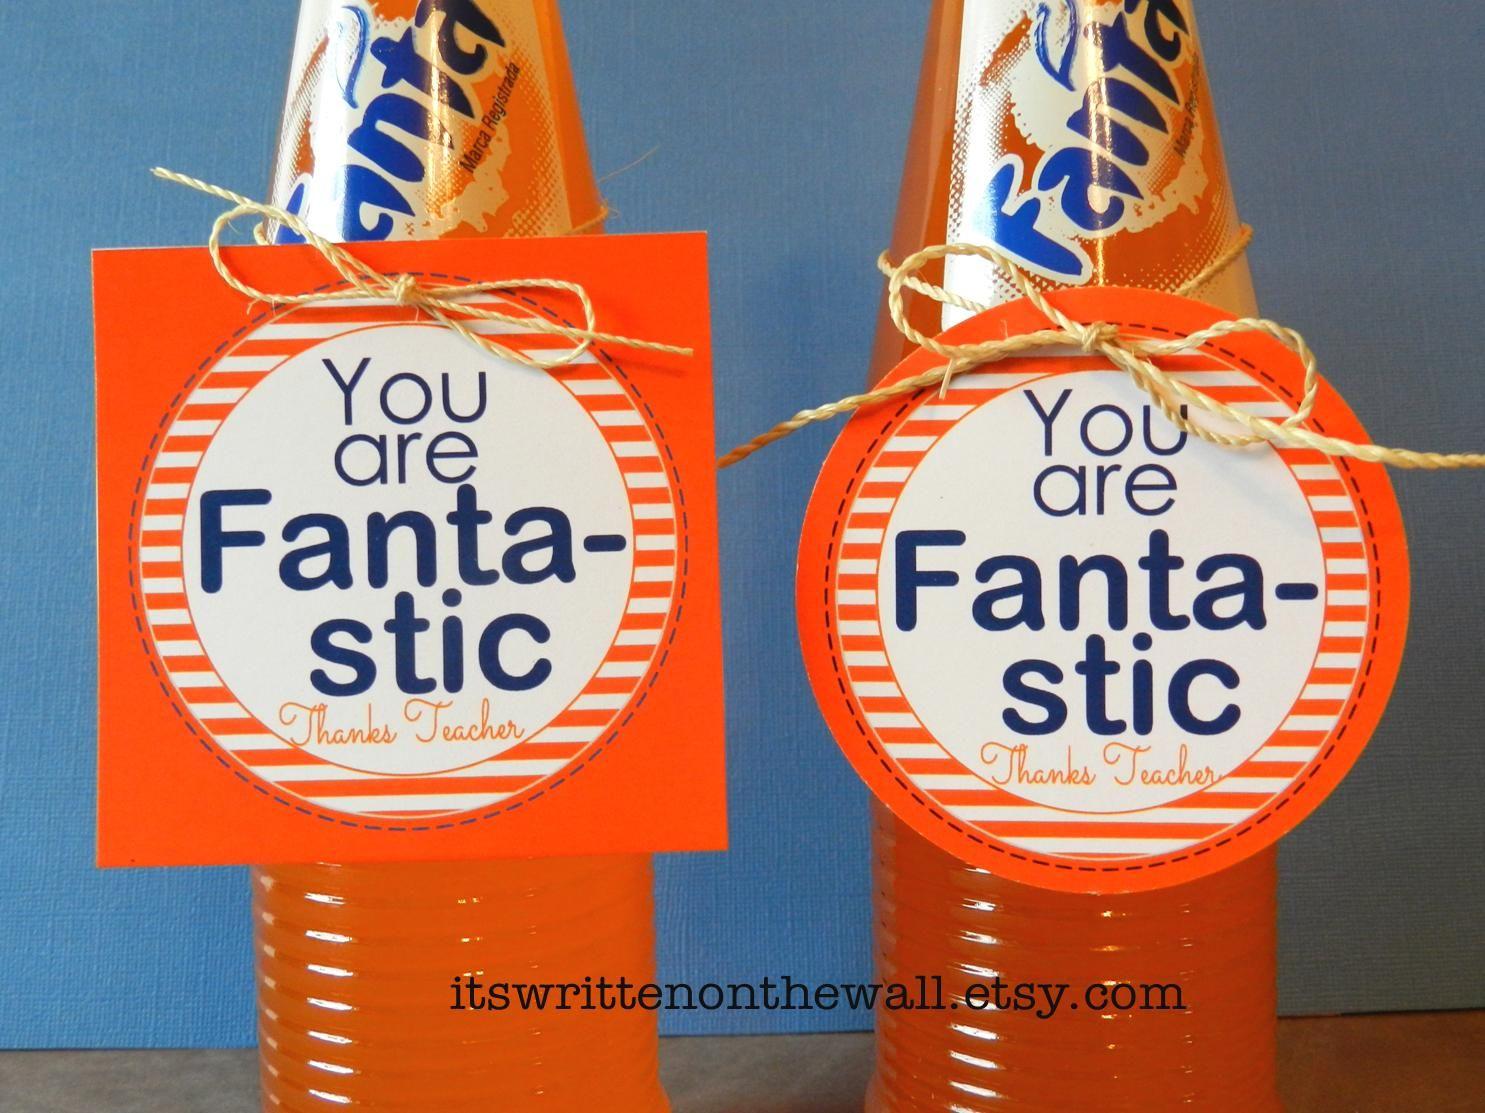 Teacher Appreciation Gift (May 7, 2013) -You Are Fanta ... - photo#15